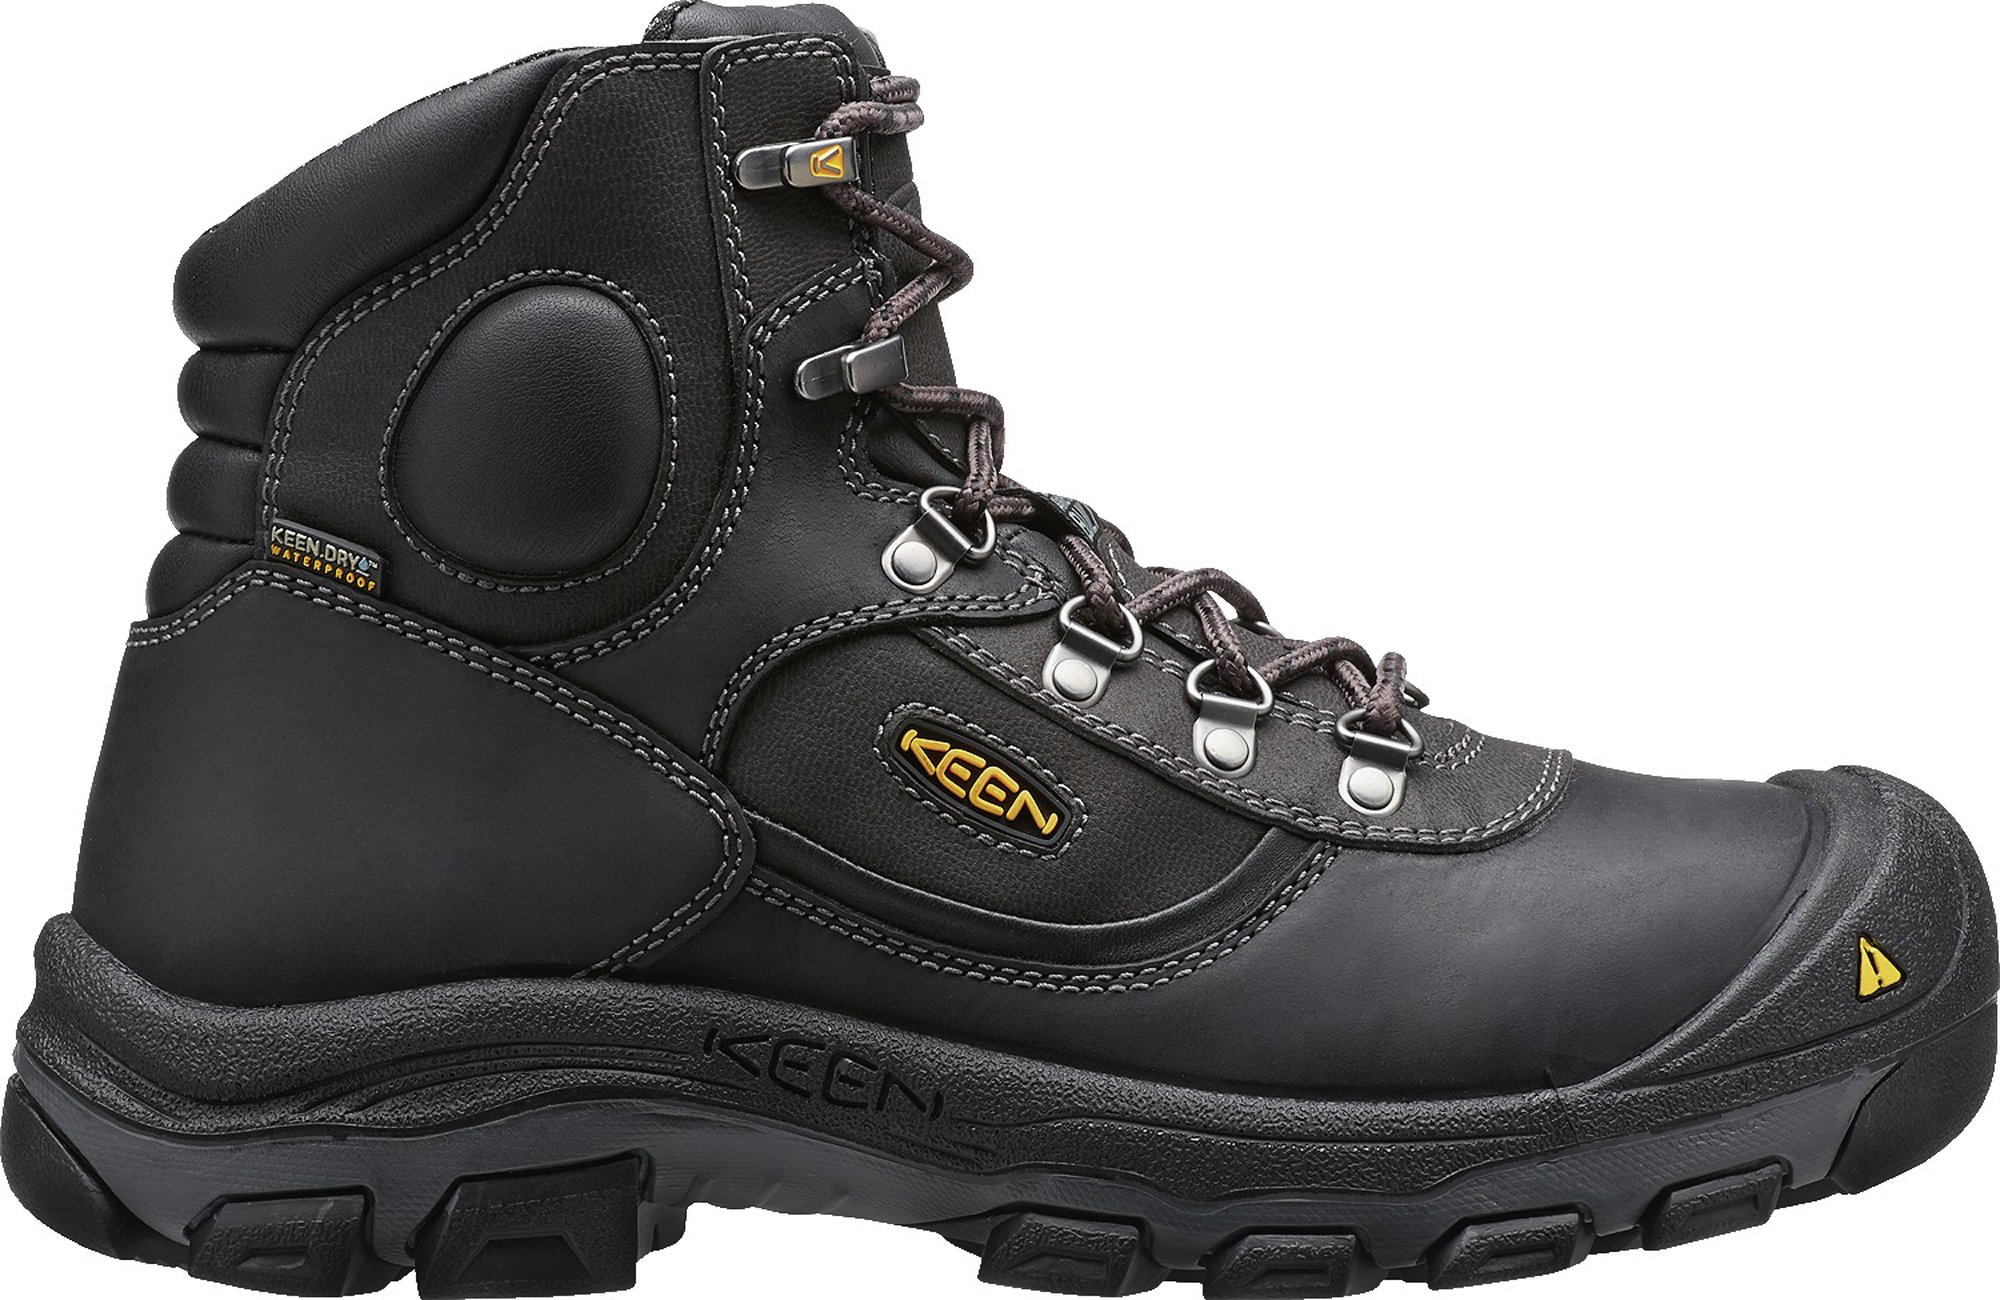 KEEN Utility Men's Leavenworth Internal Met 6 inch Work Boot, Black, 11 D US